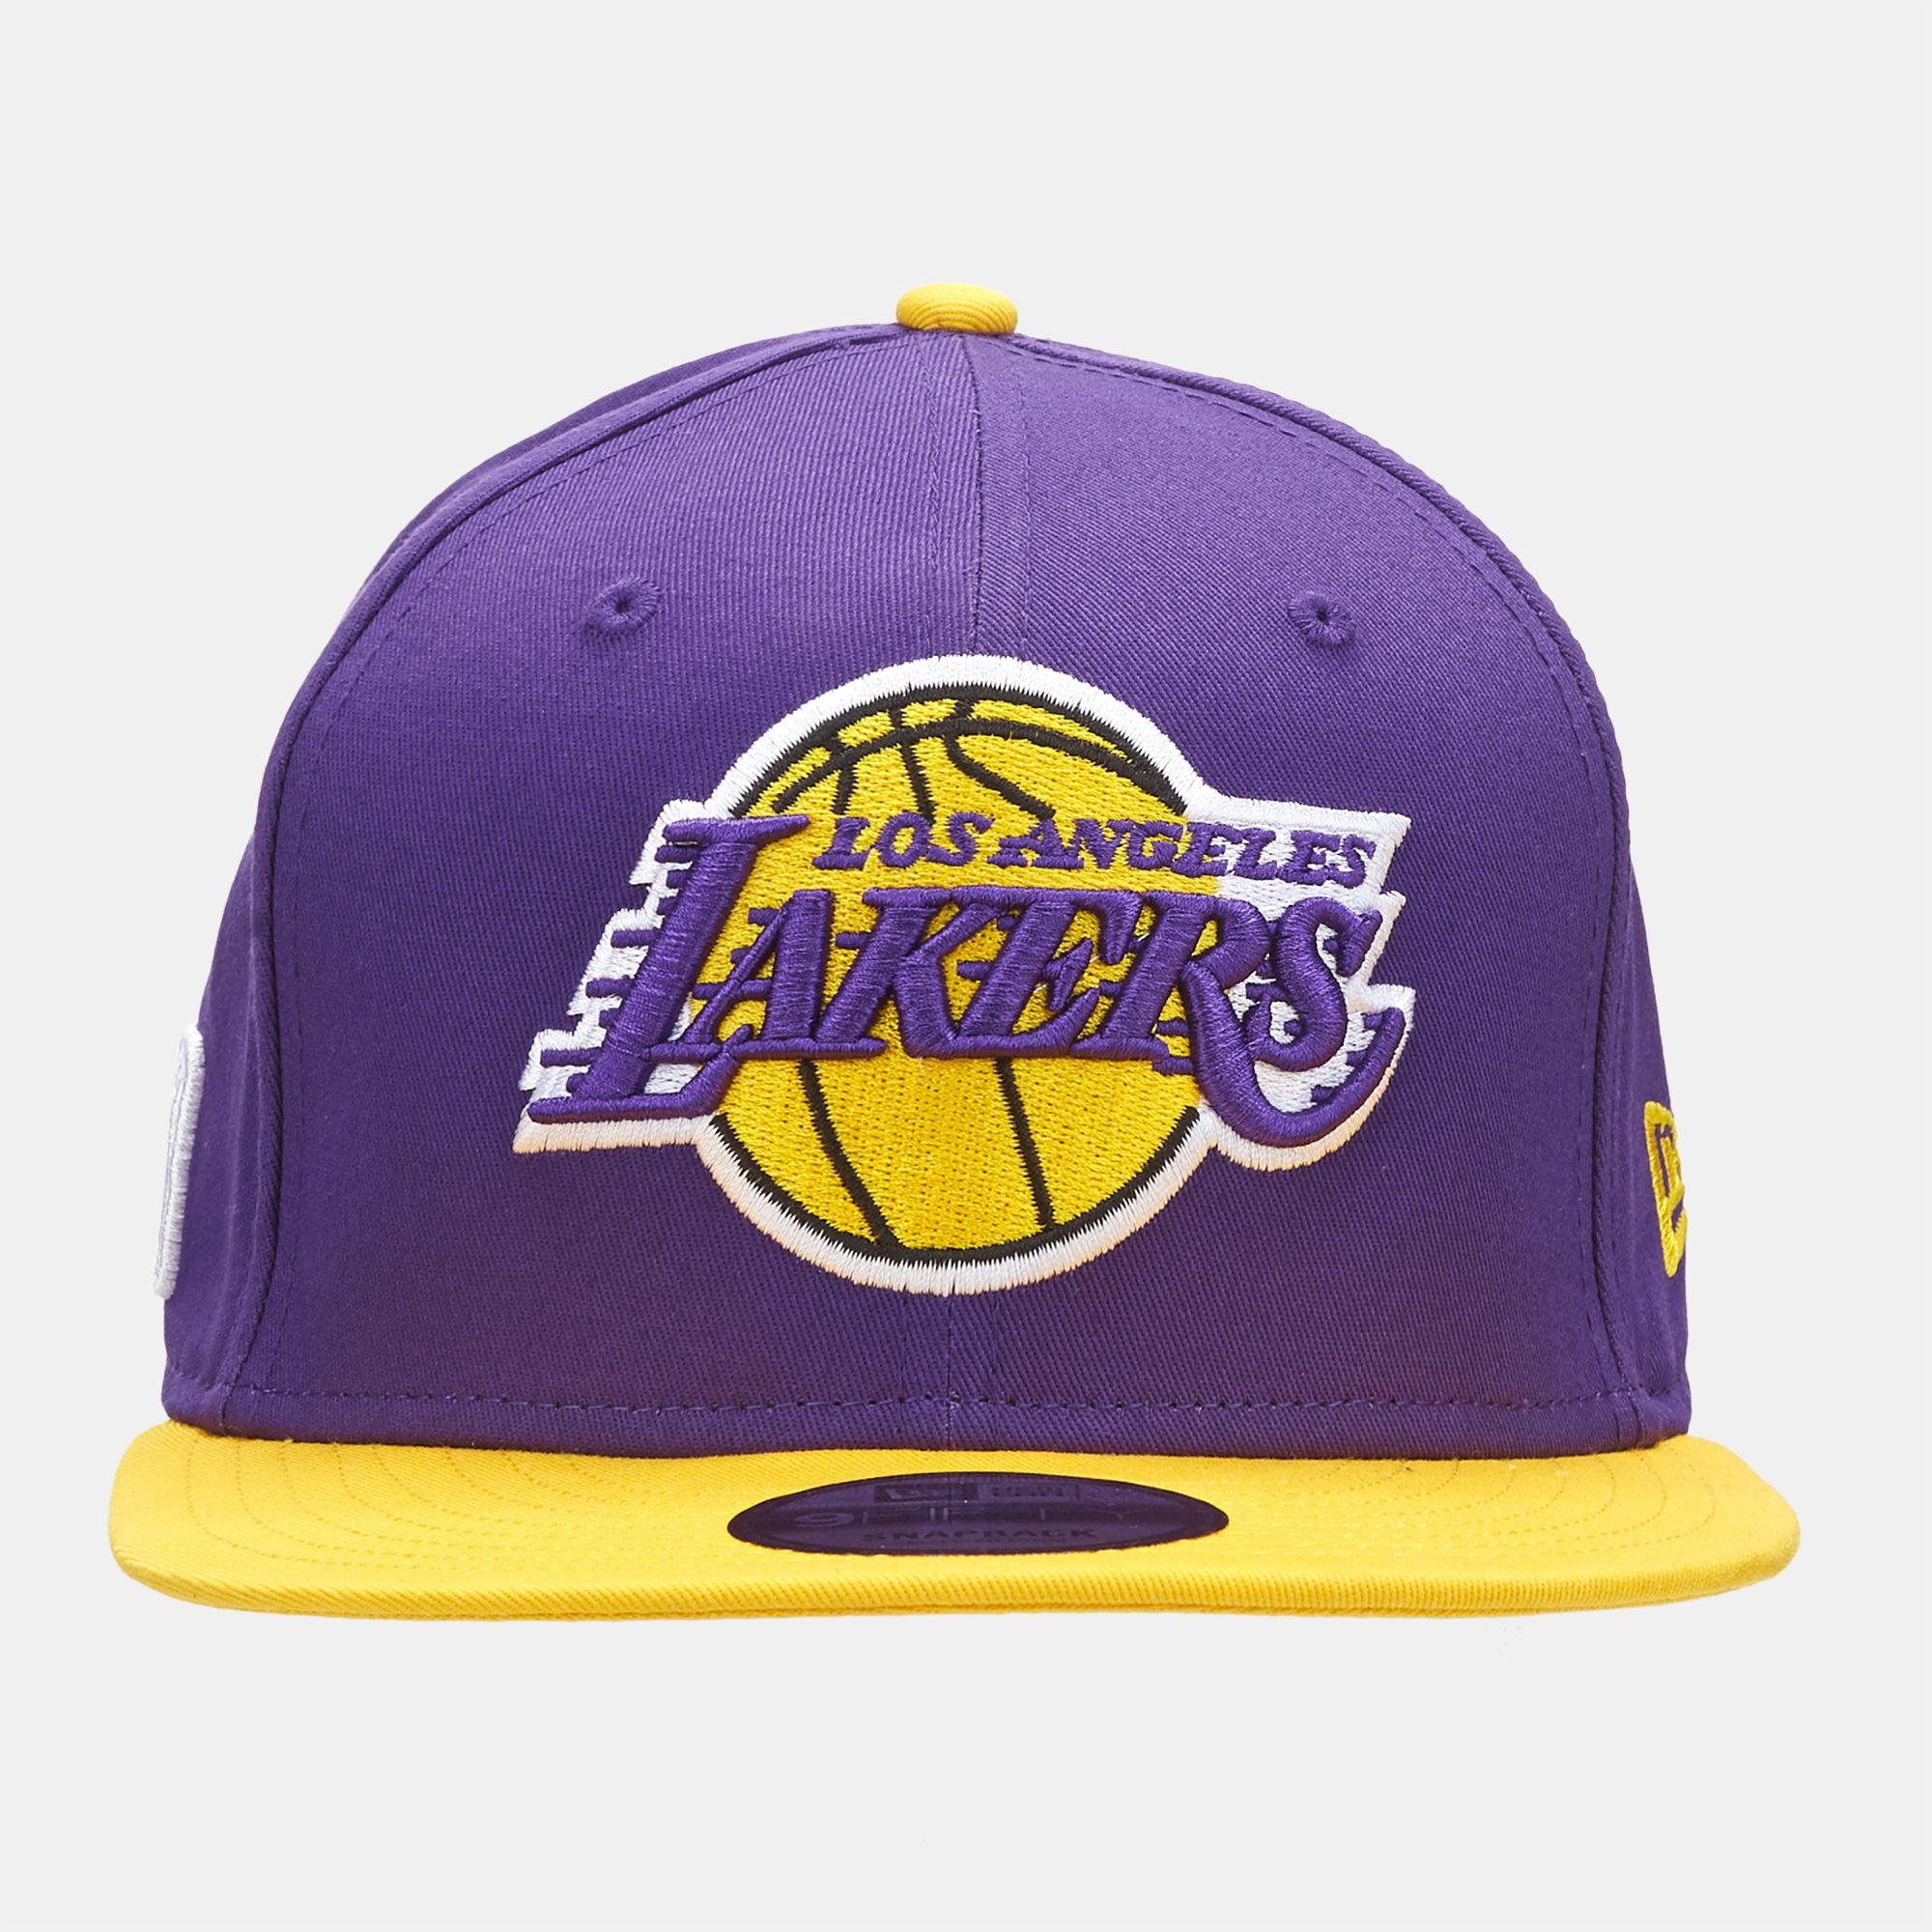 c2868009ebd7c9 Shop Purple New Era NBA Los Angeles Lakers 9FIFTY Snapback Cap for ...